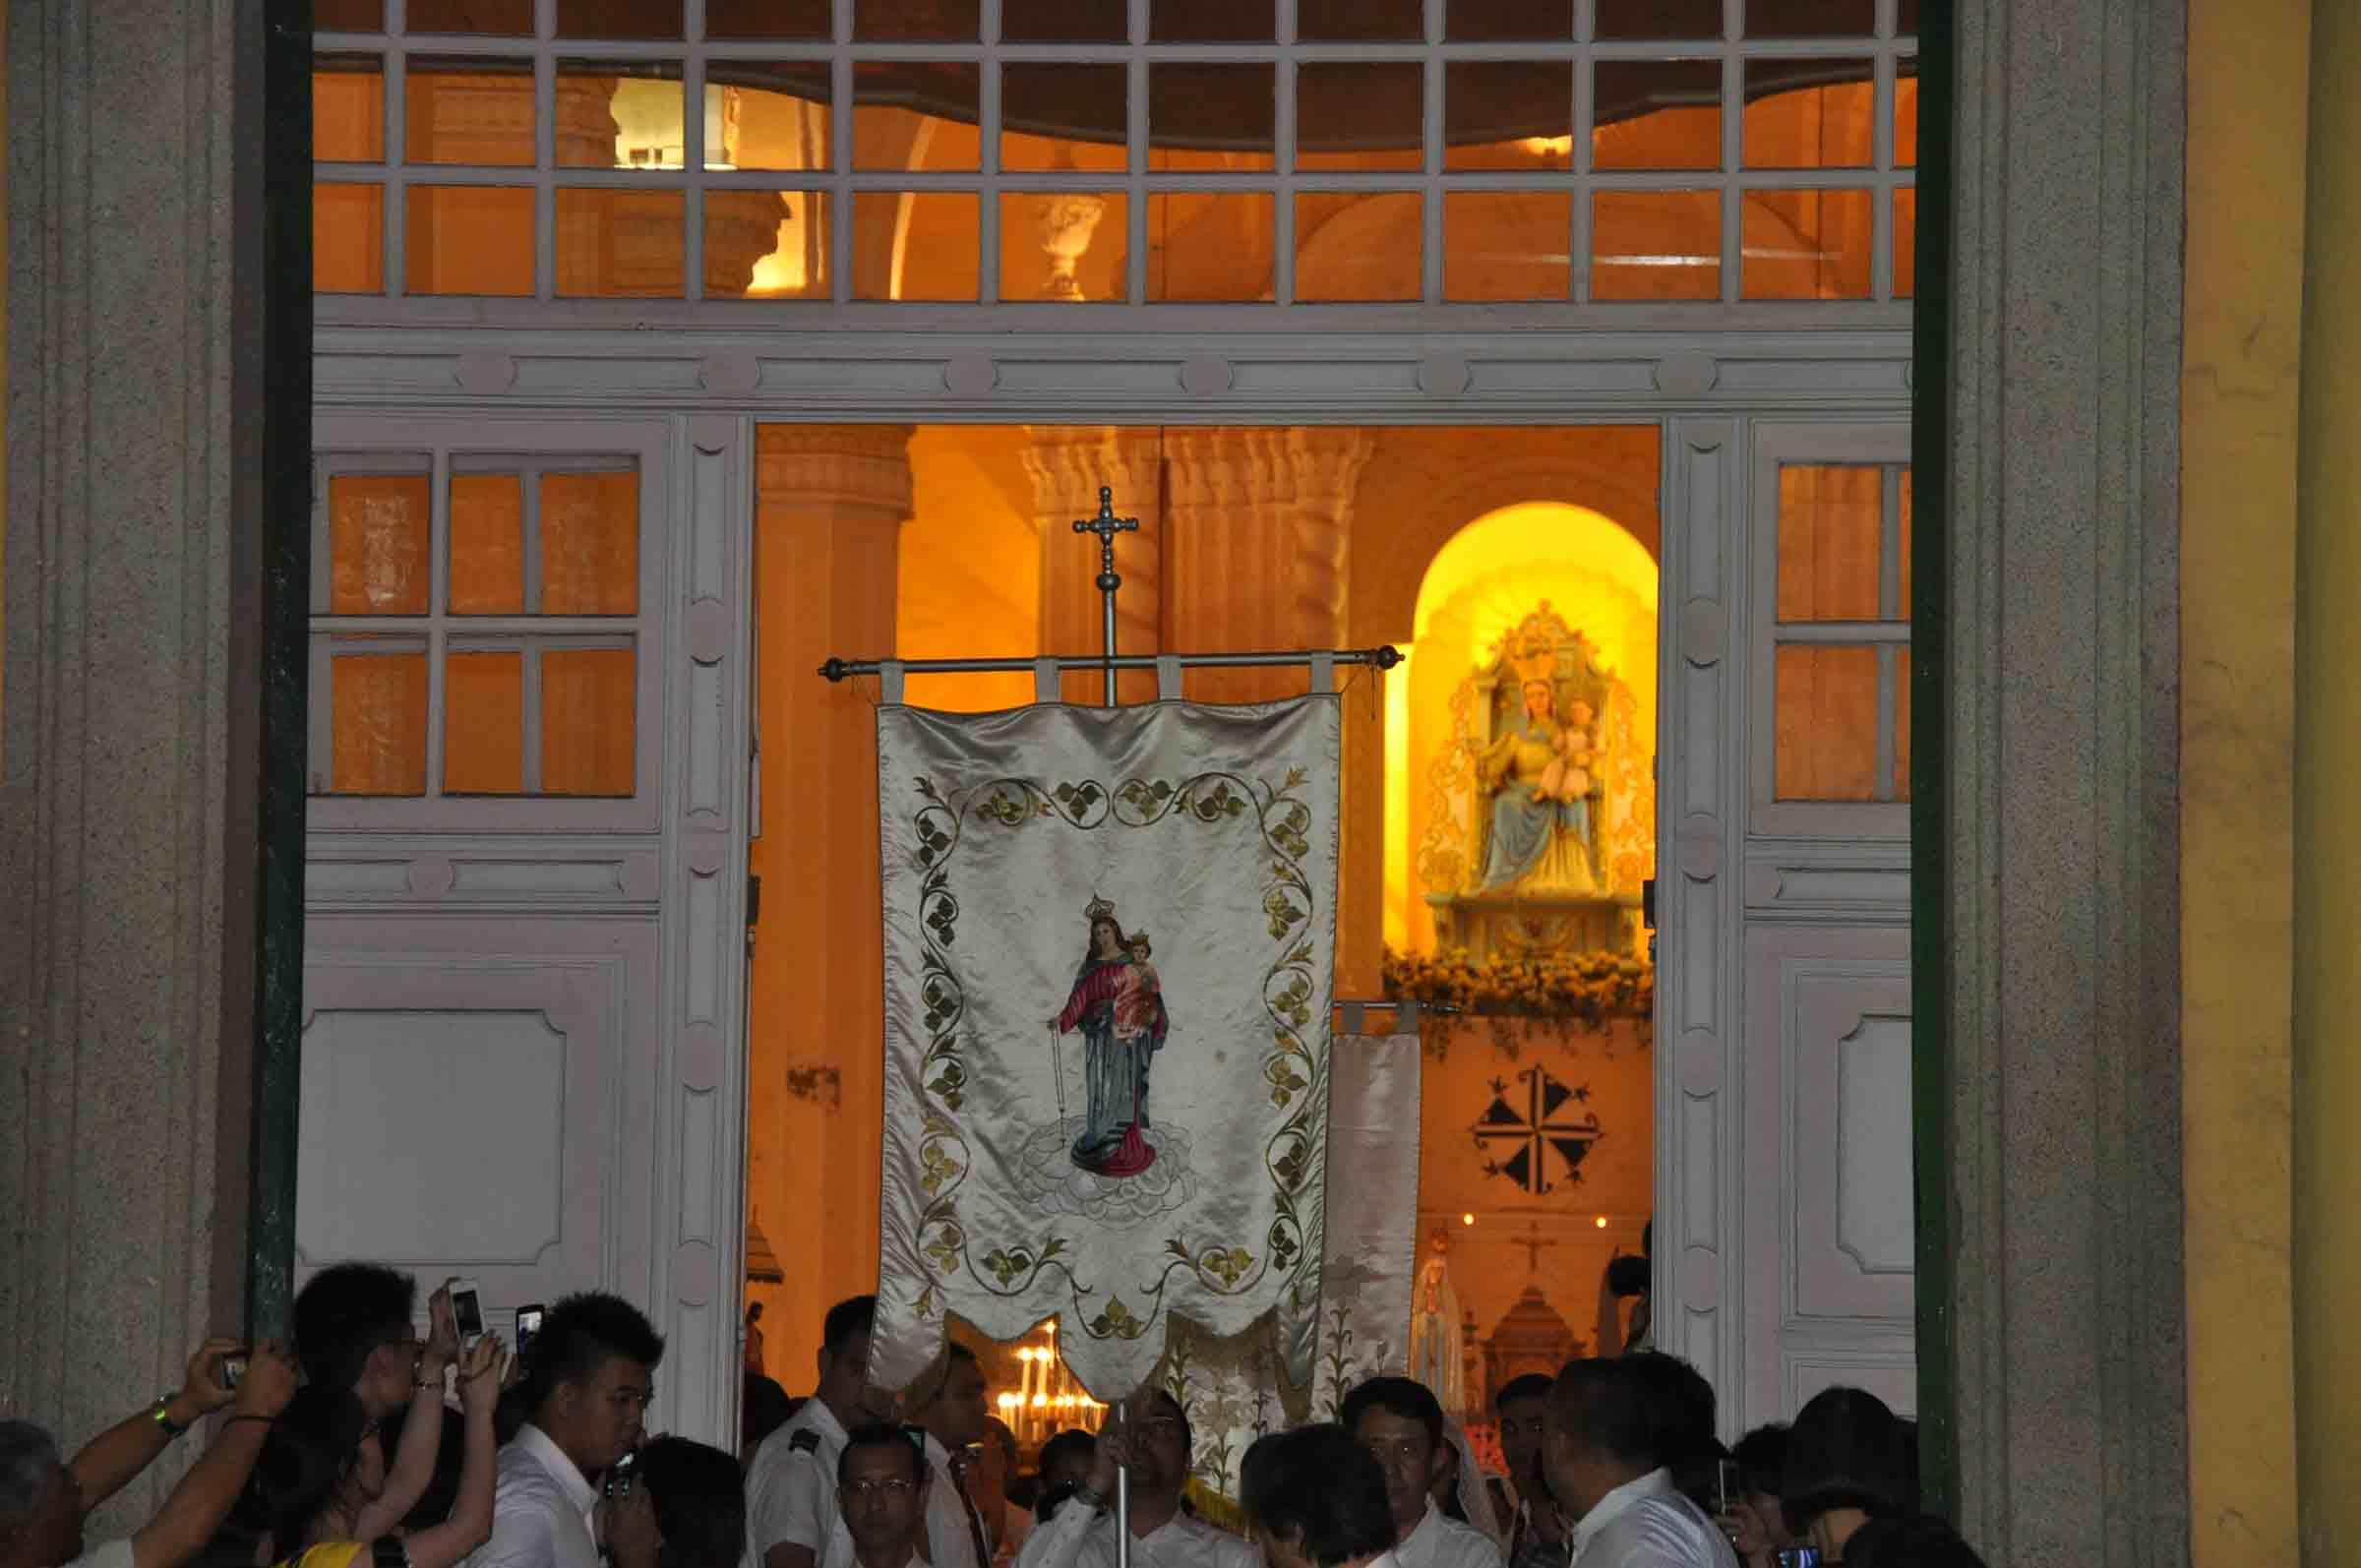 Macau's Our Lady of Fatima Procession starts at St Dominics Church